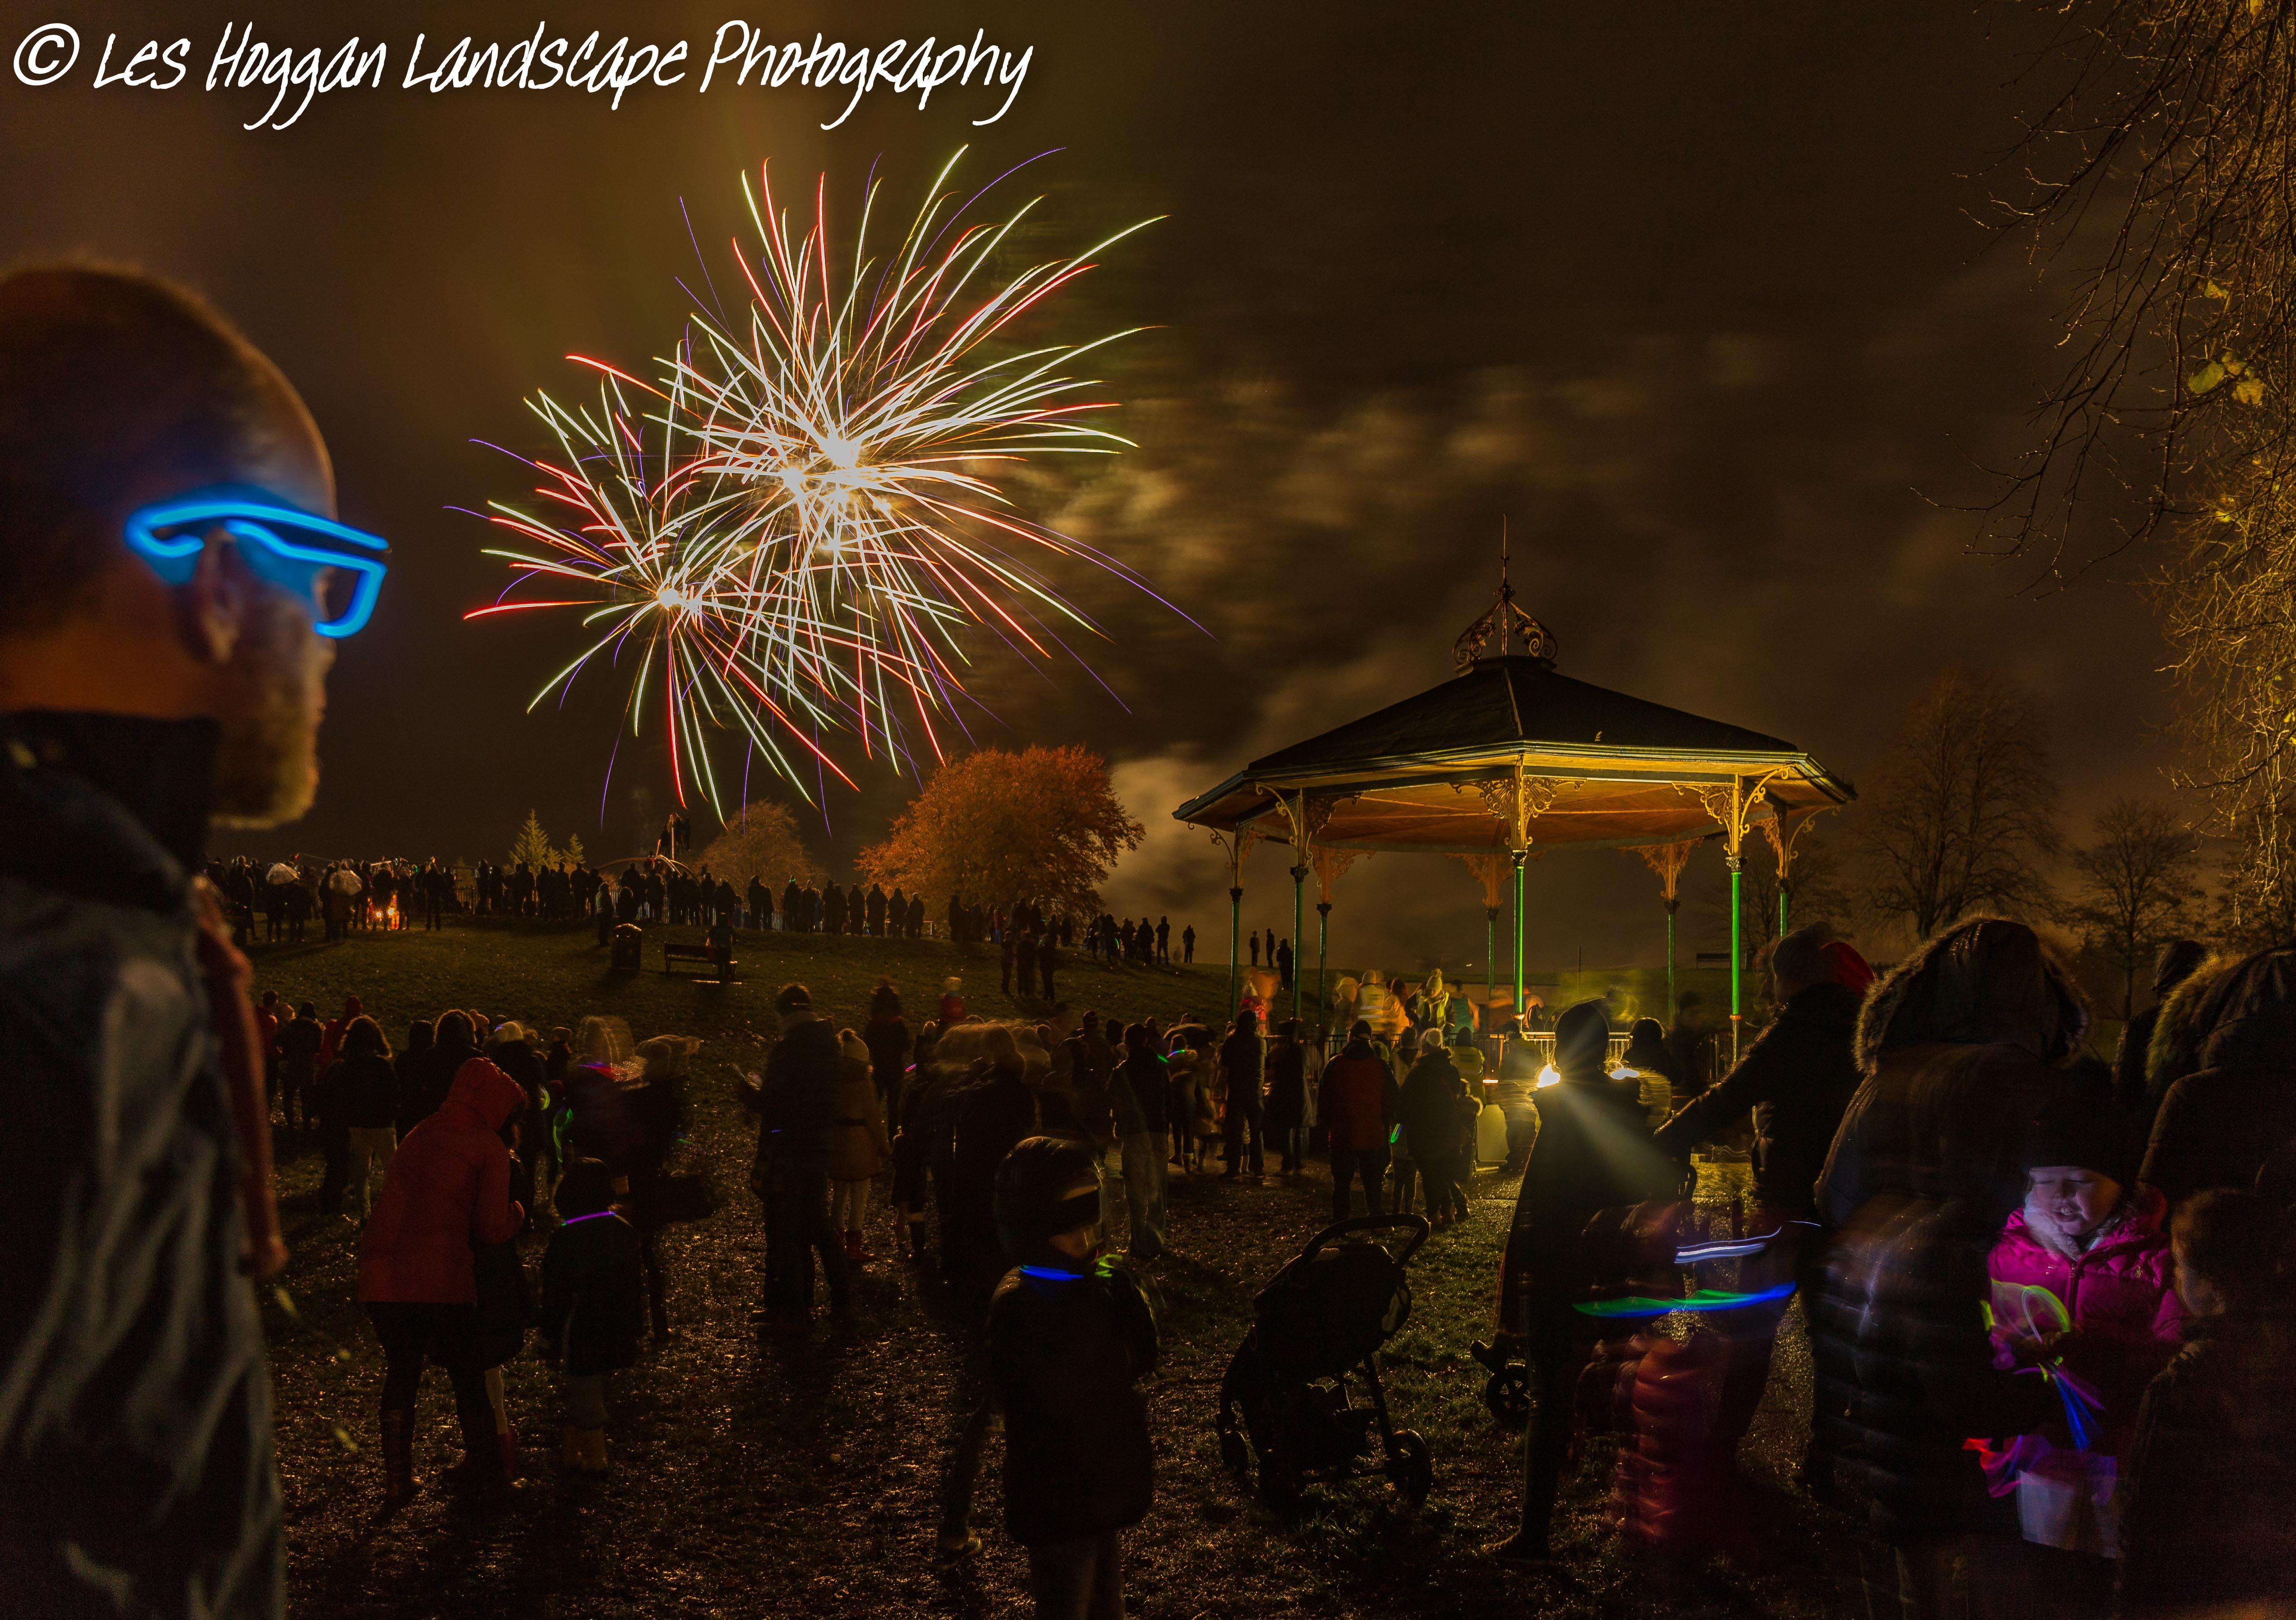 Fireworks-2252